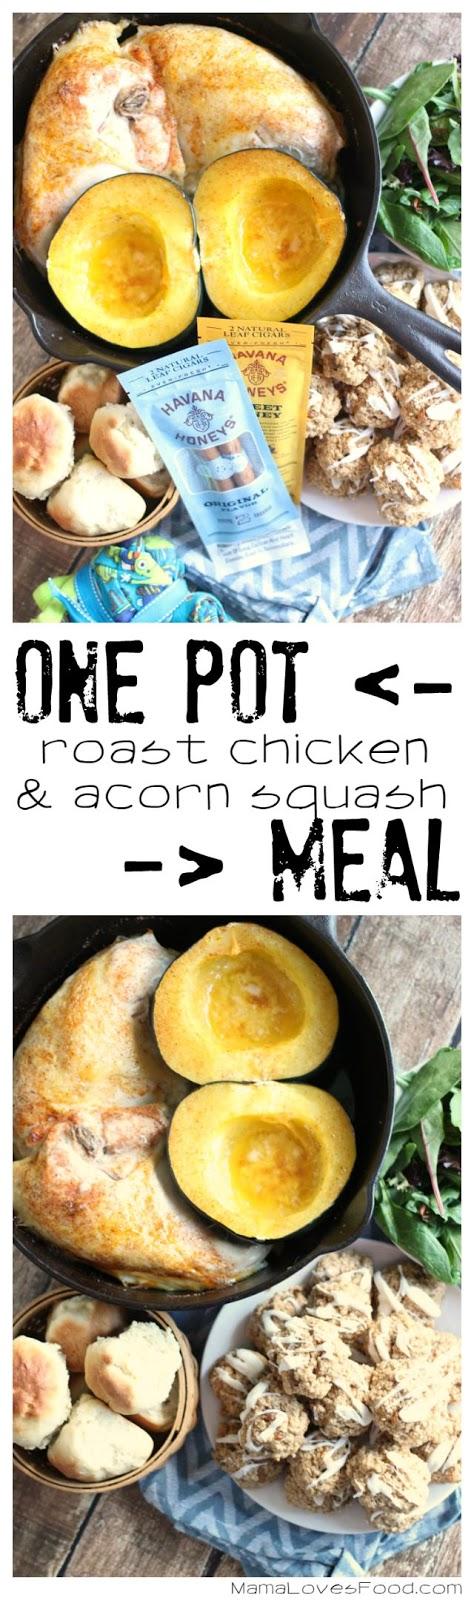 One Pot Roast Chicken and Acorn Squash Recipe